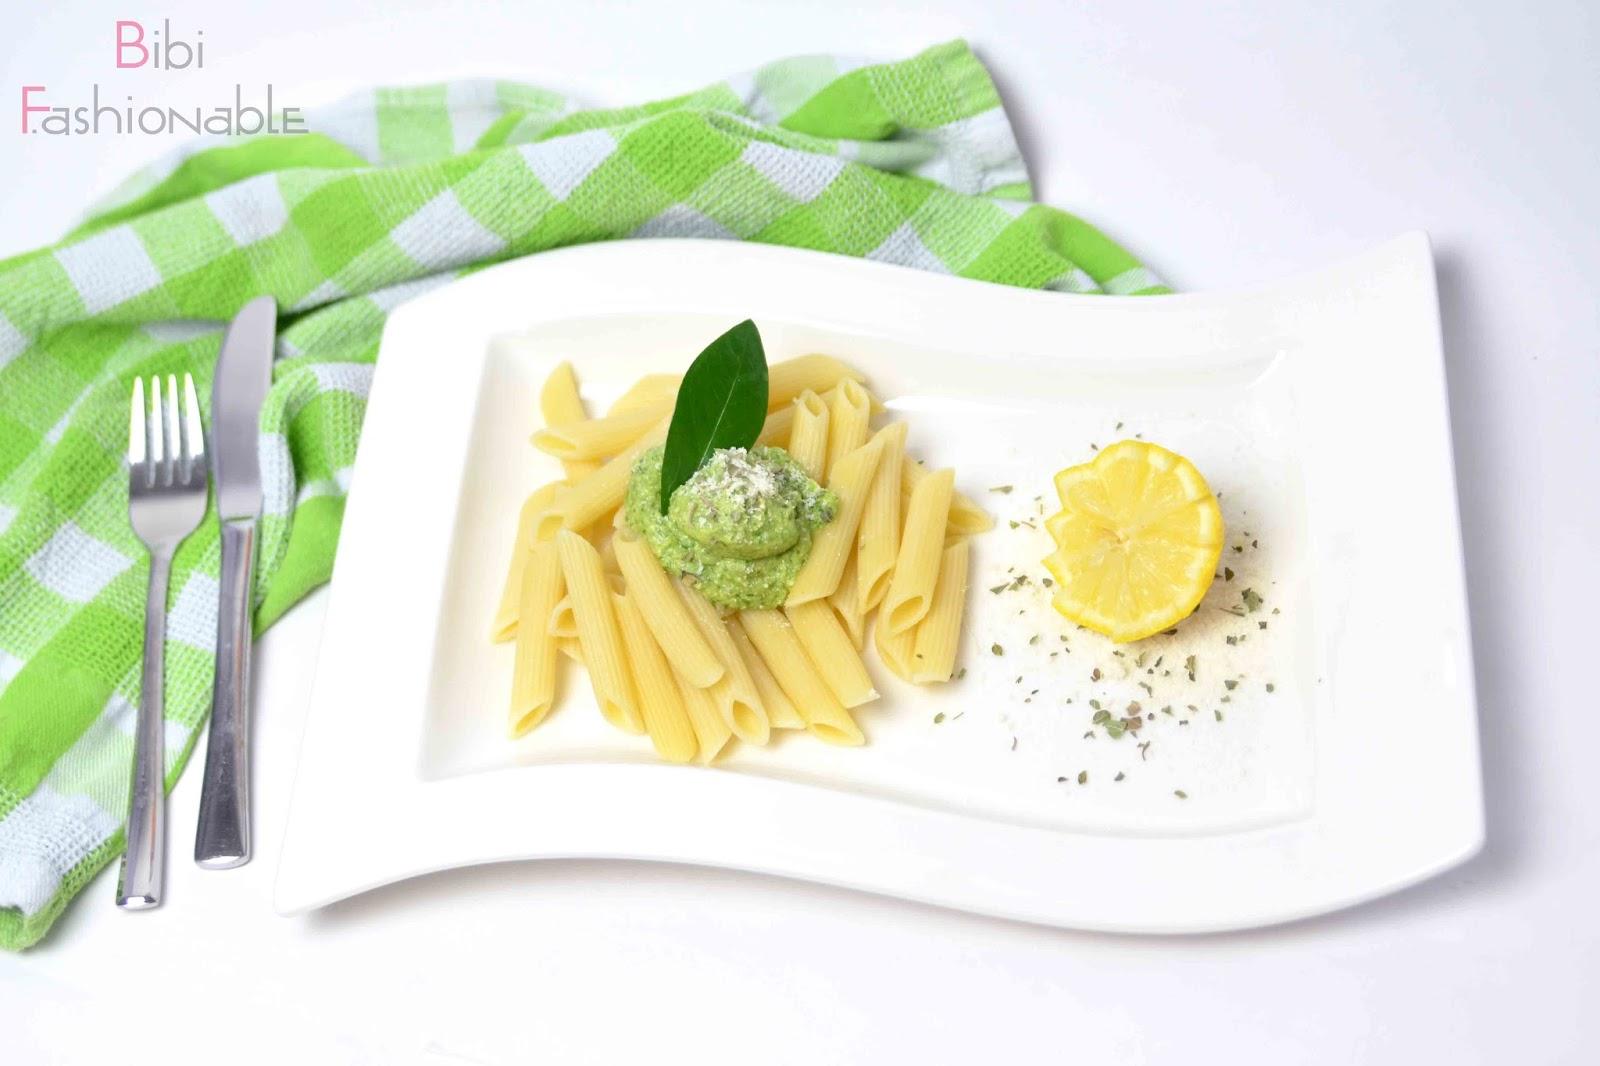 schmackhaftes Avocado-Pesto Titelbild